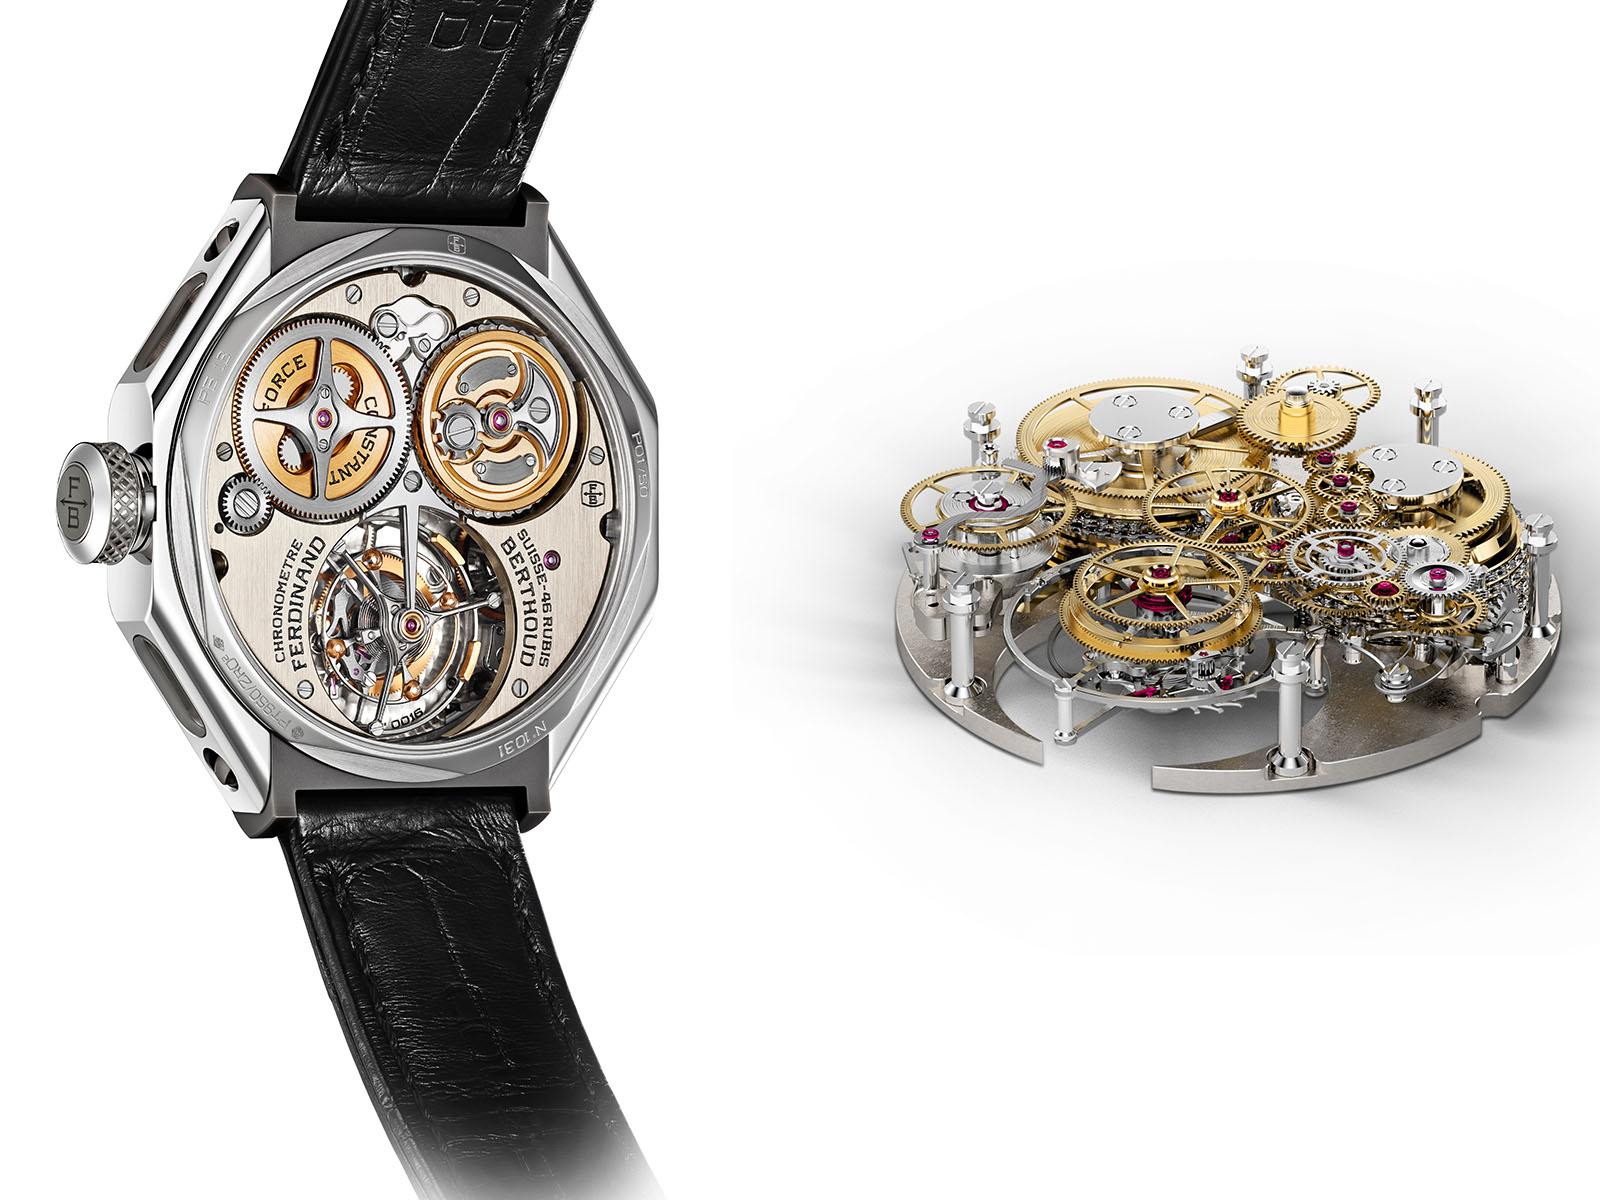 Chronometrie-Ferdinand-Berthoud-FB-1-3-5.jpg